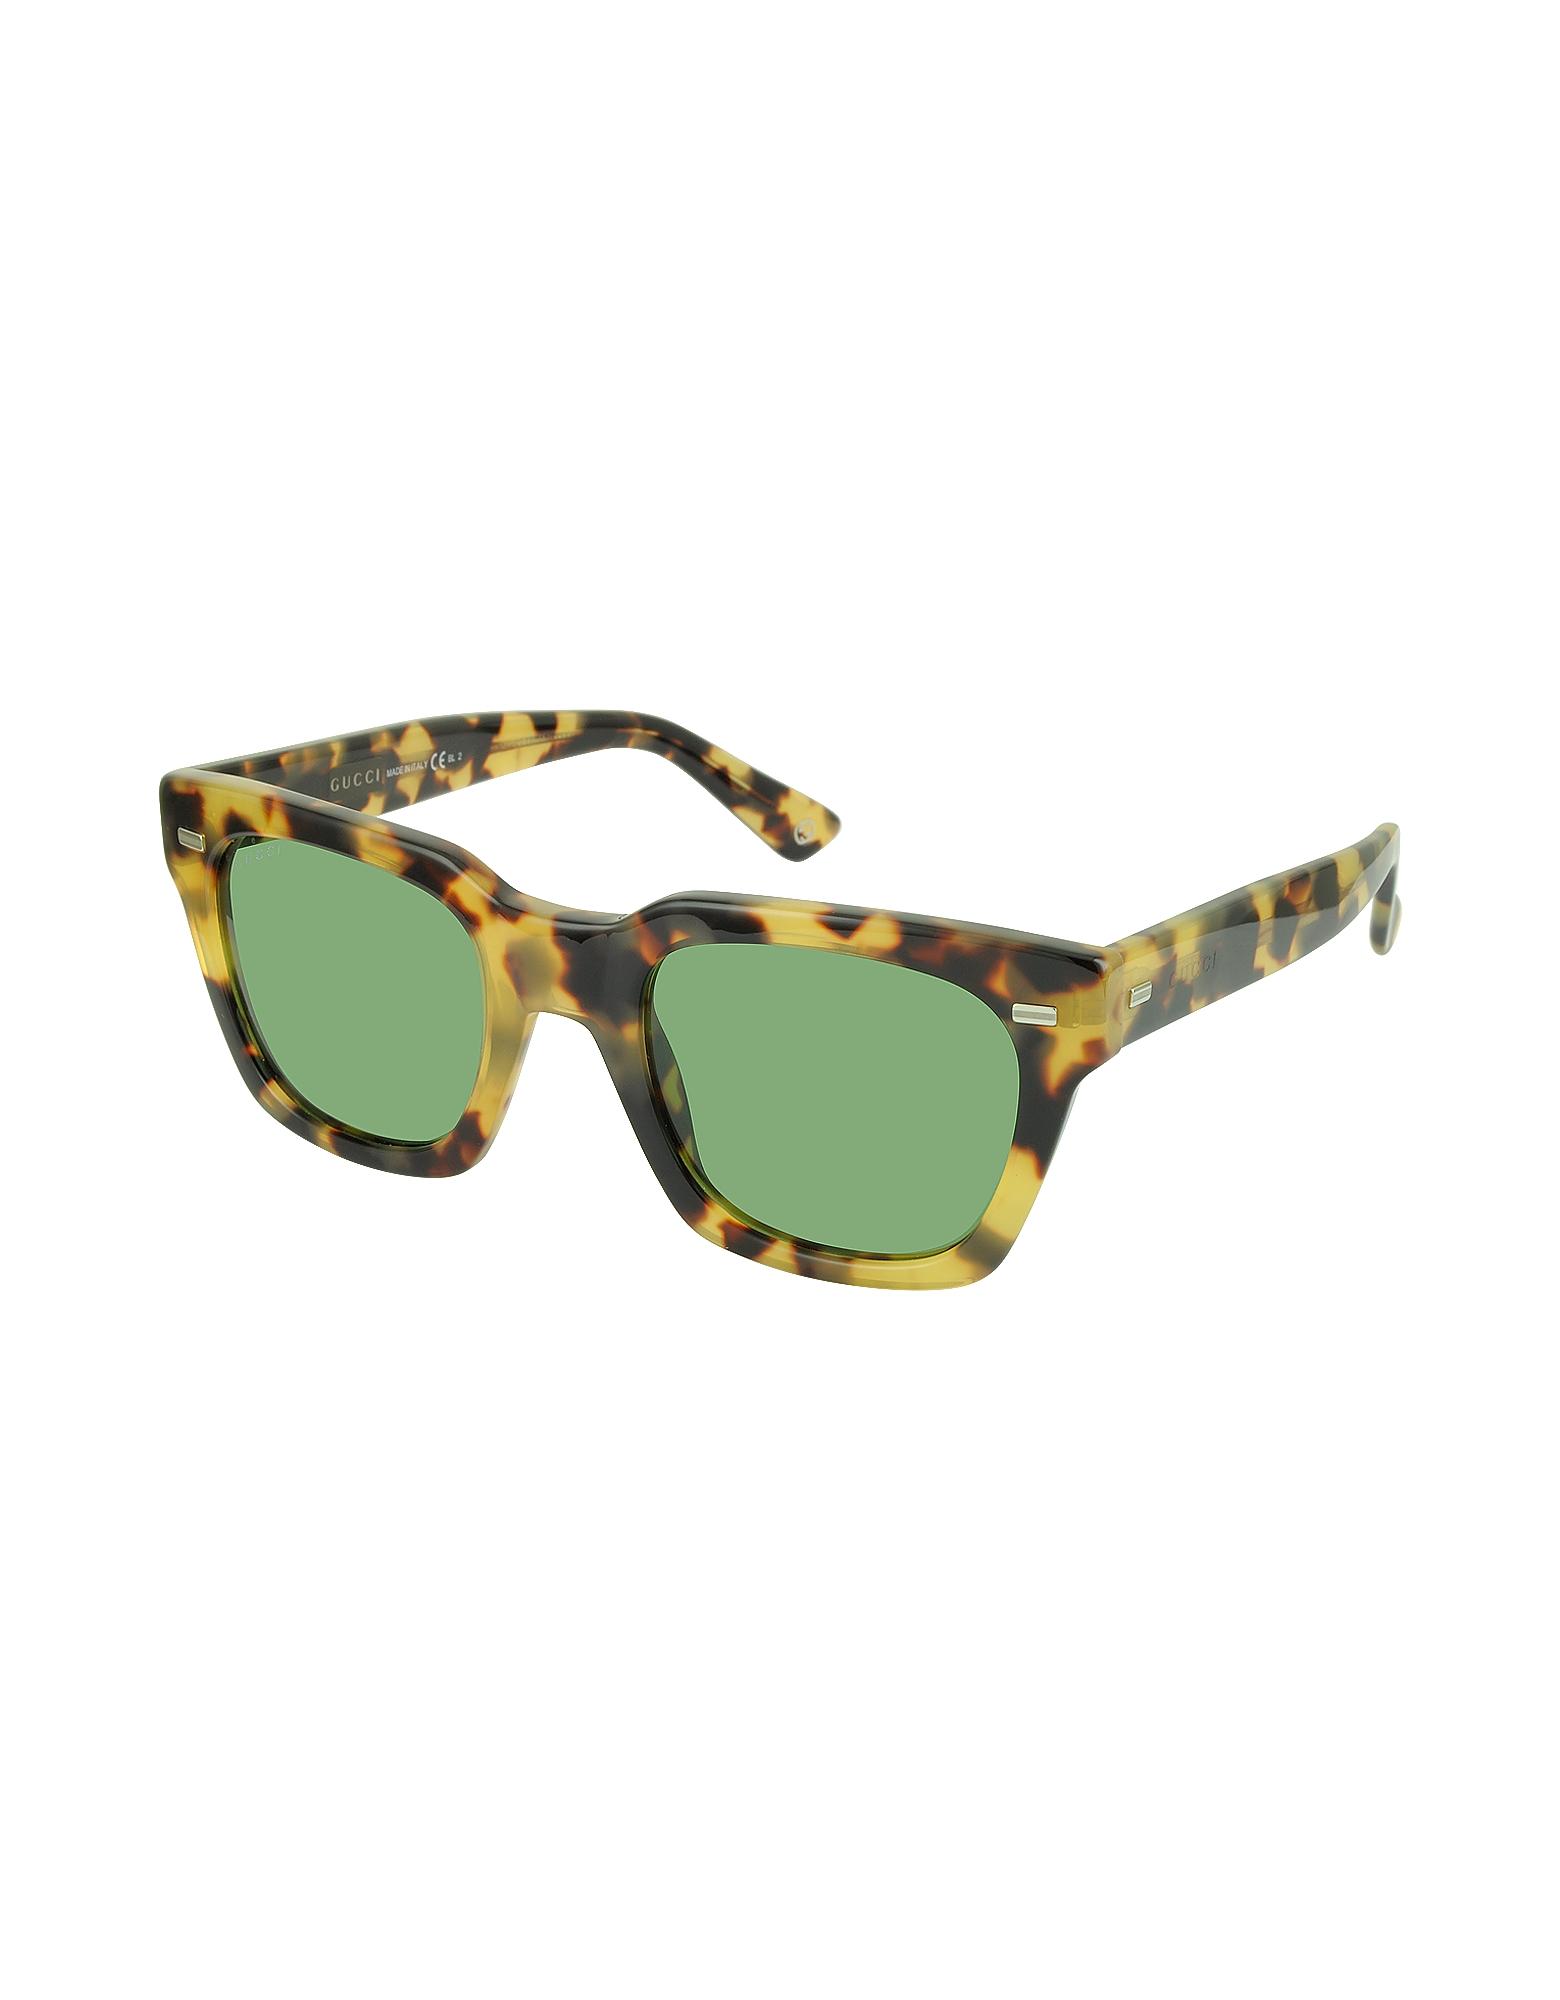 GG 1099/S 00FDJ Havana Acetate Square Frame Sunglasses от Forzieri.com INT